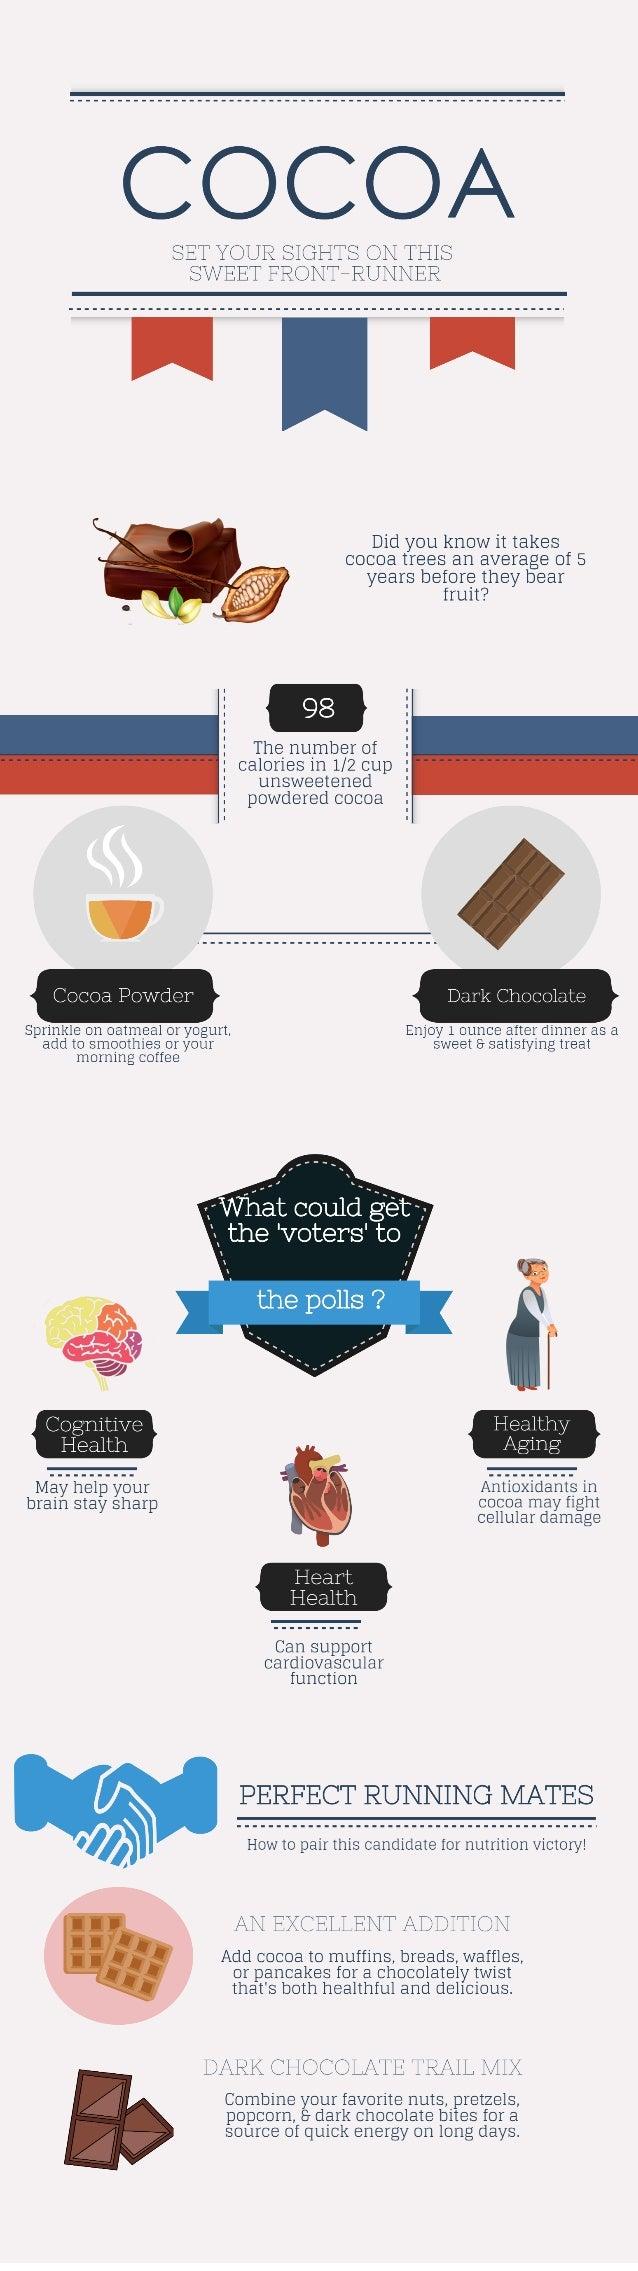 Vote For Cocoa [INFOGRAPHIC]